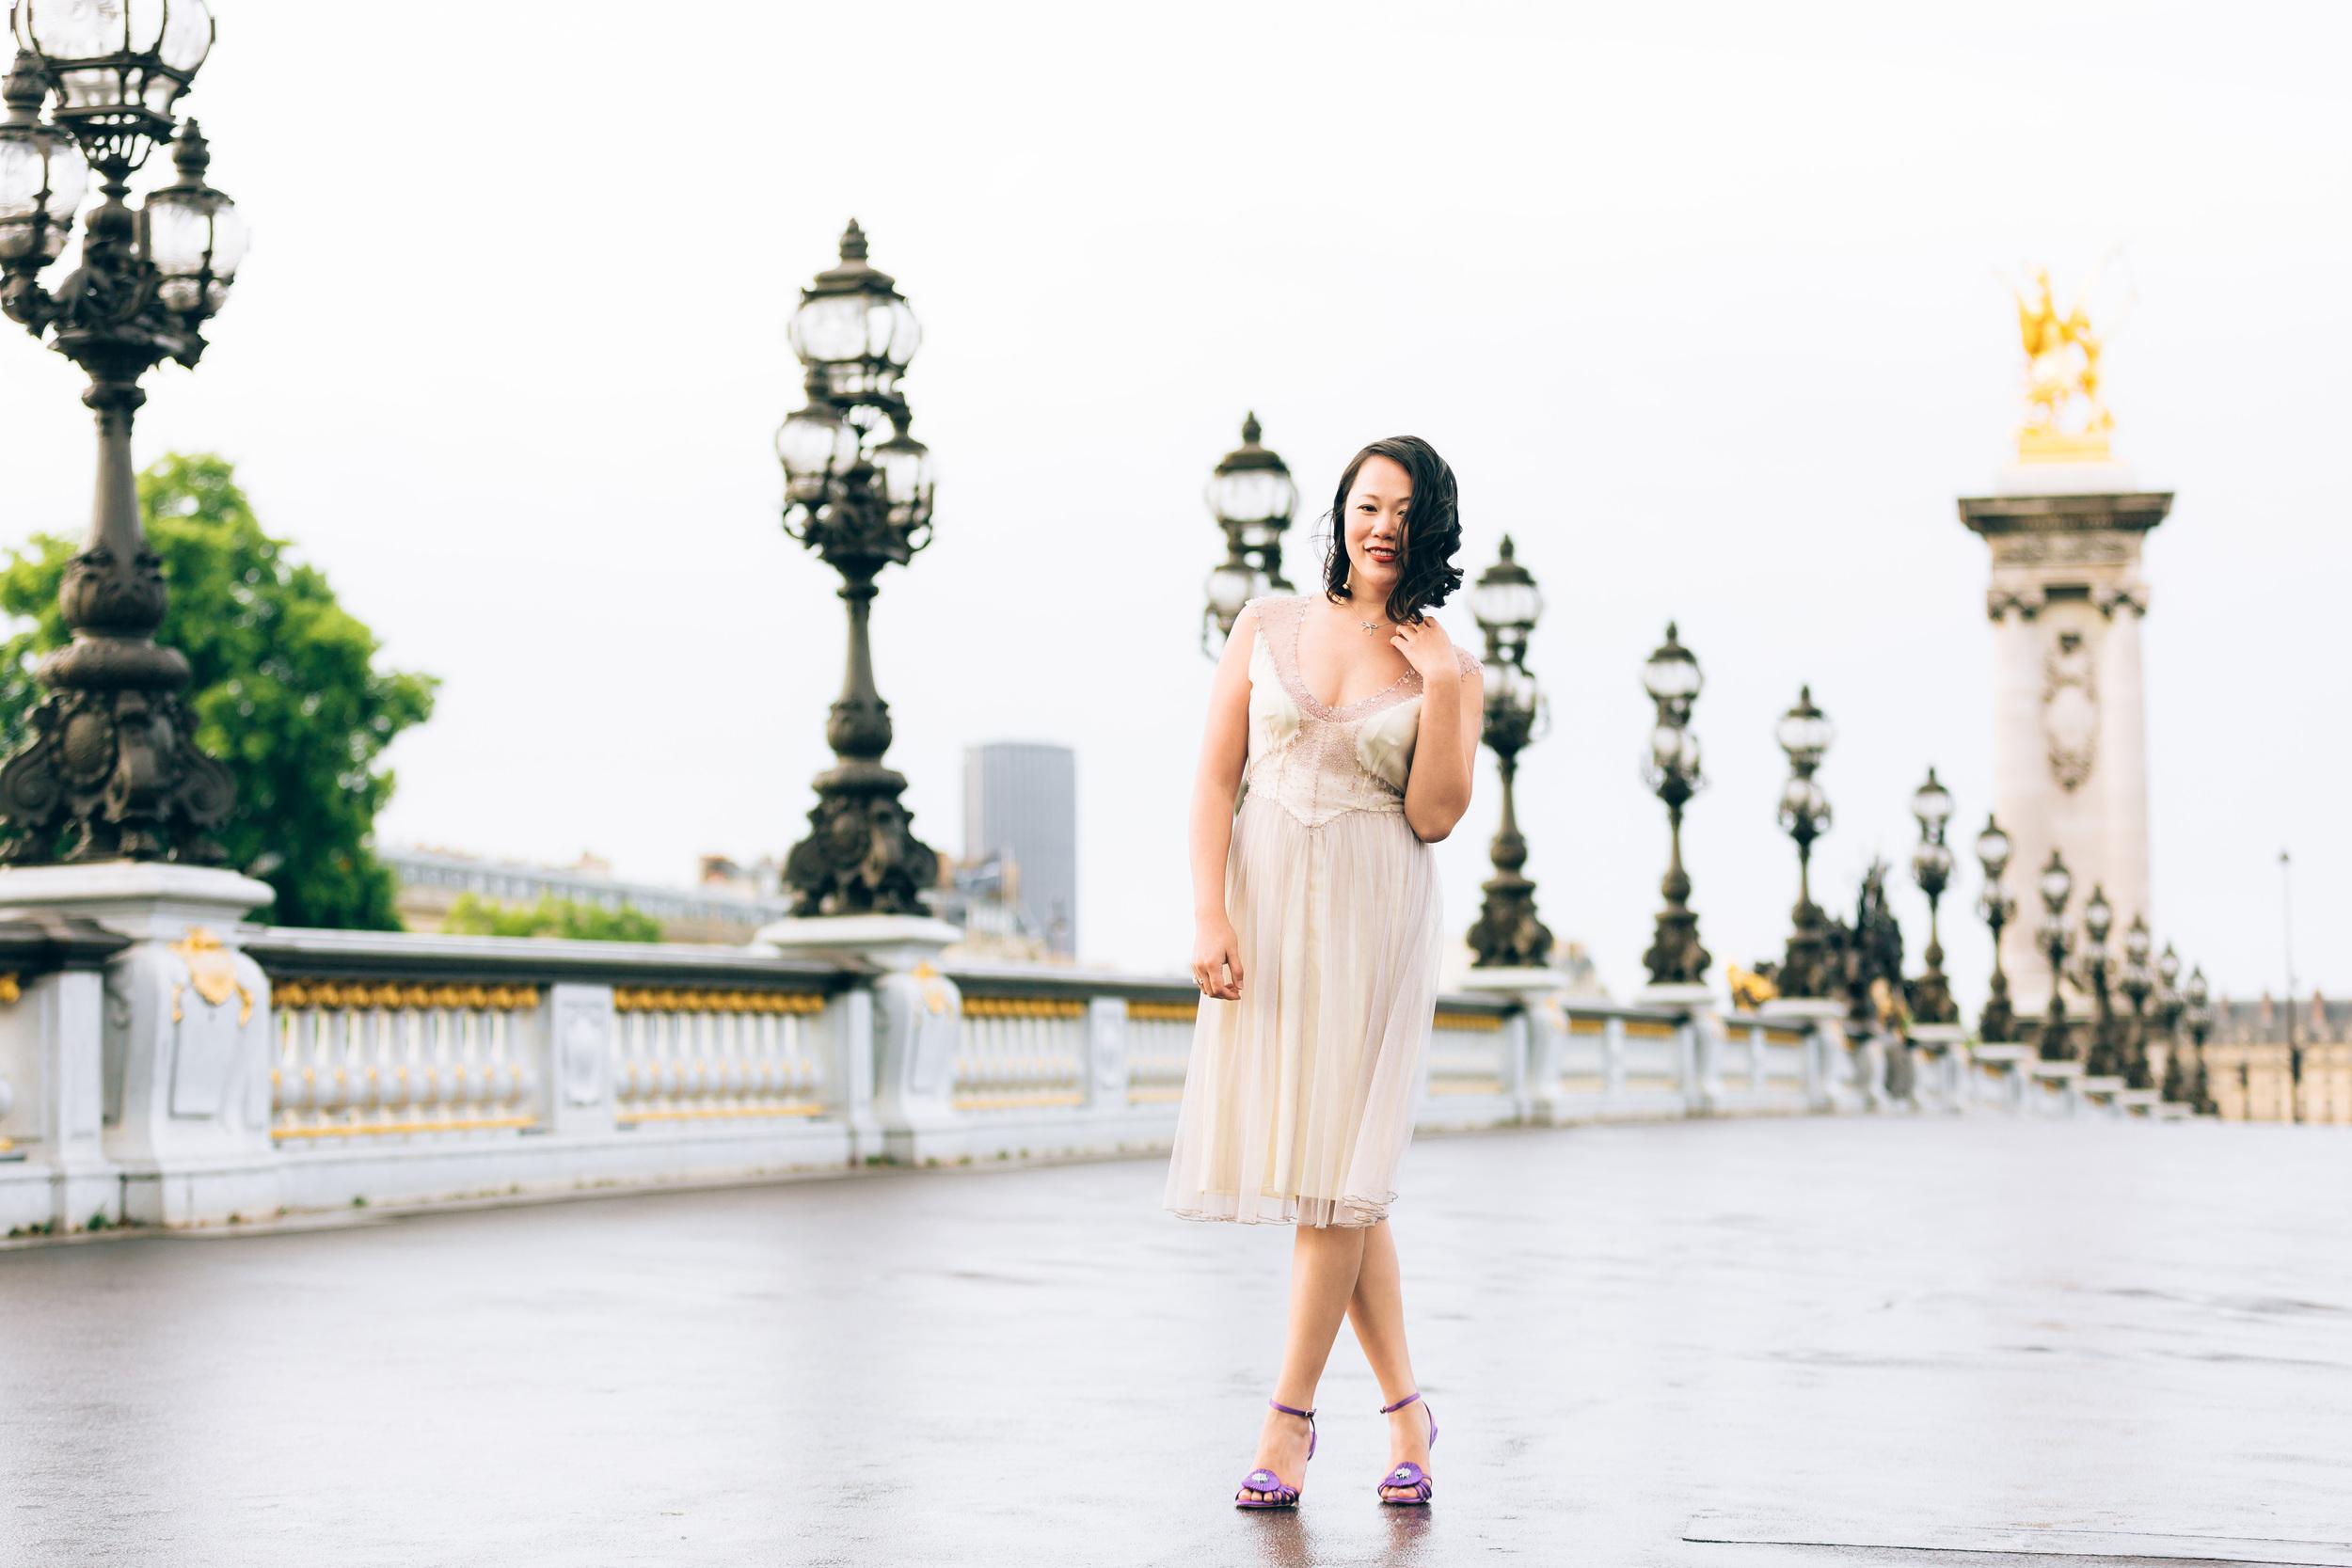 Photographer in Paris, Alexander 3 bridge, Birthday, individual portrait, IheartParisfr